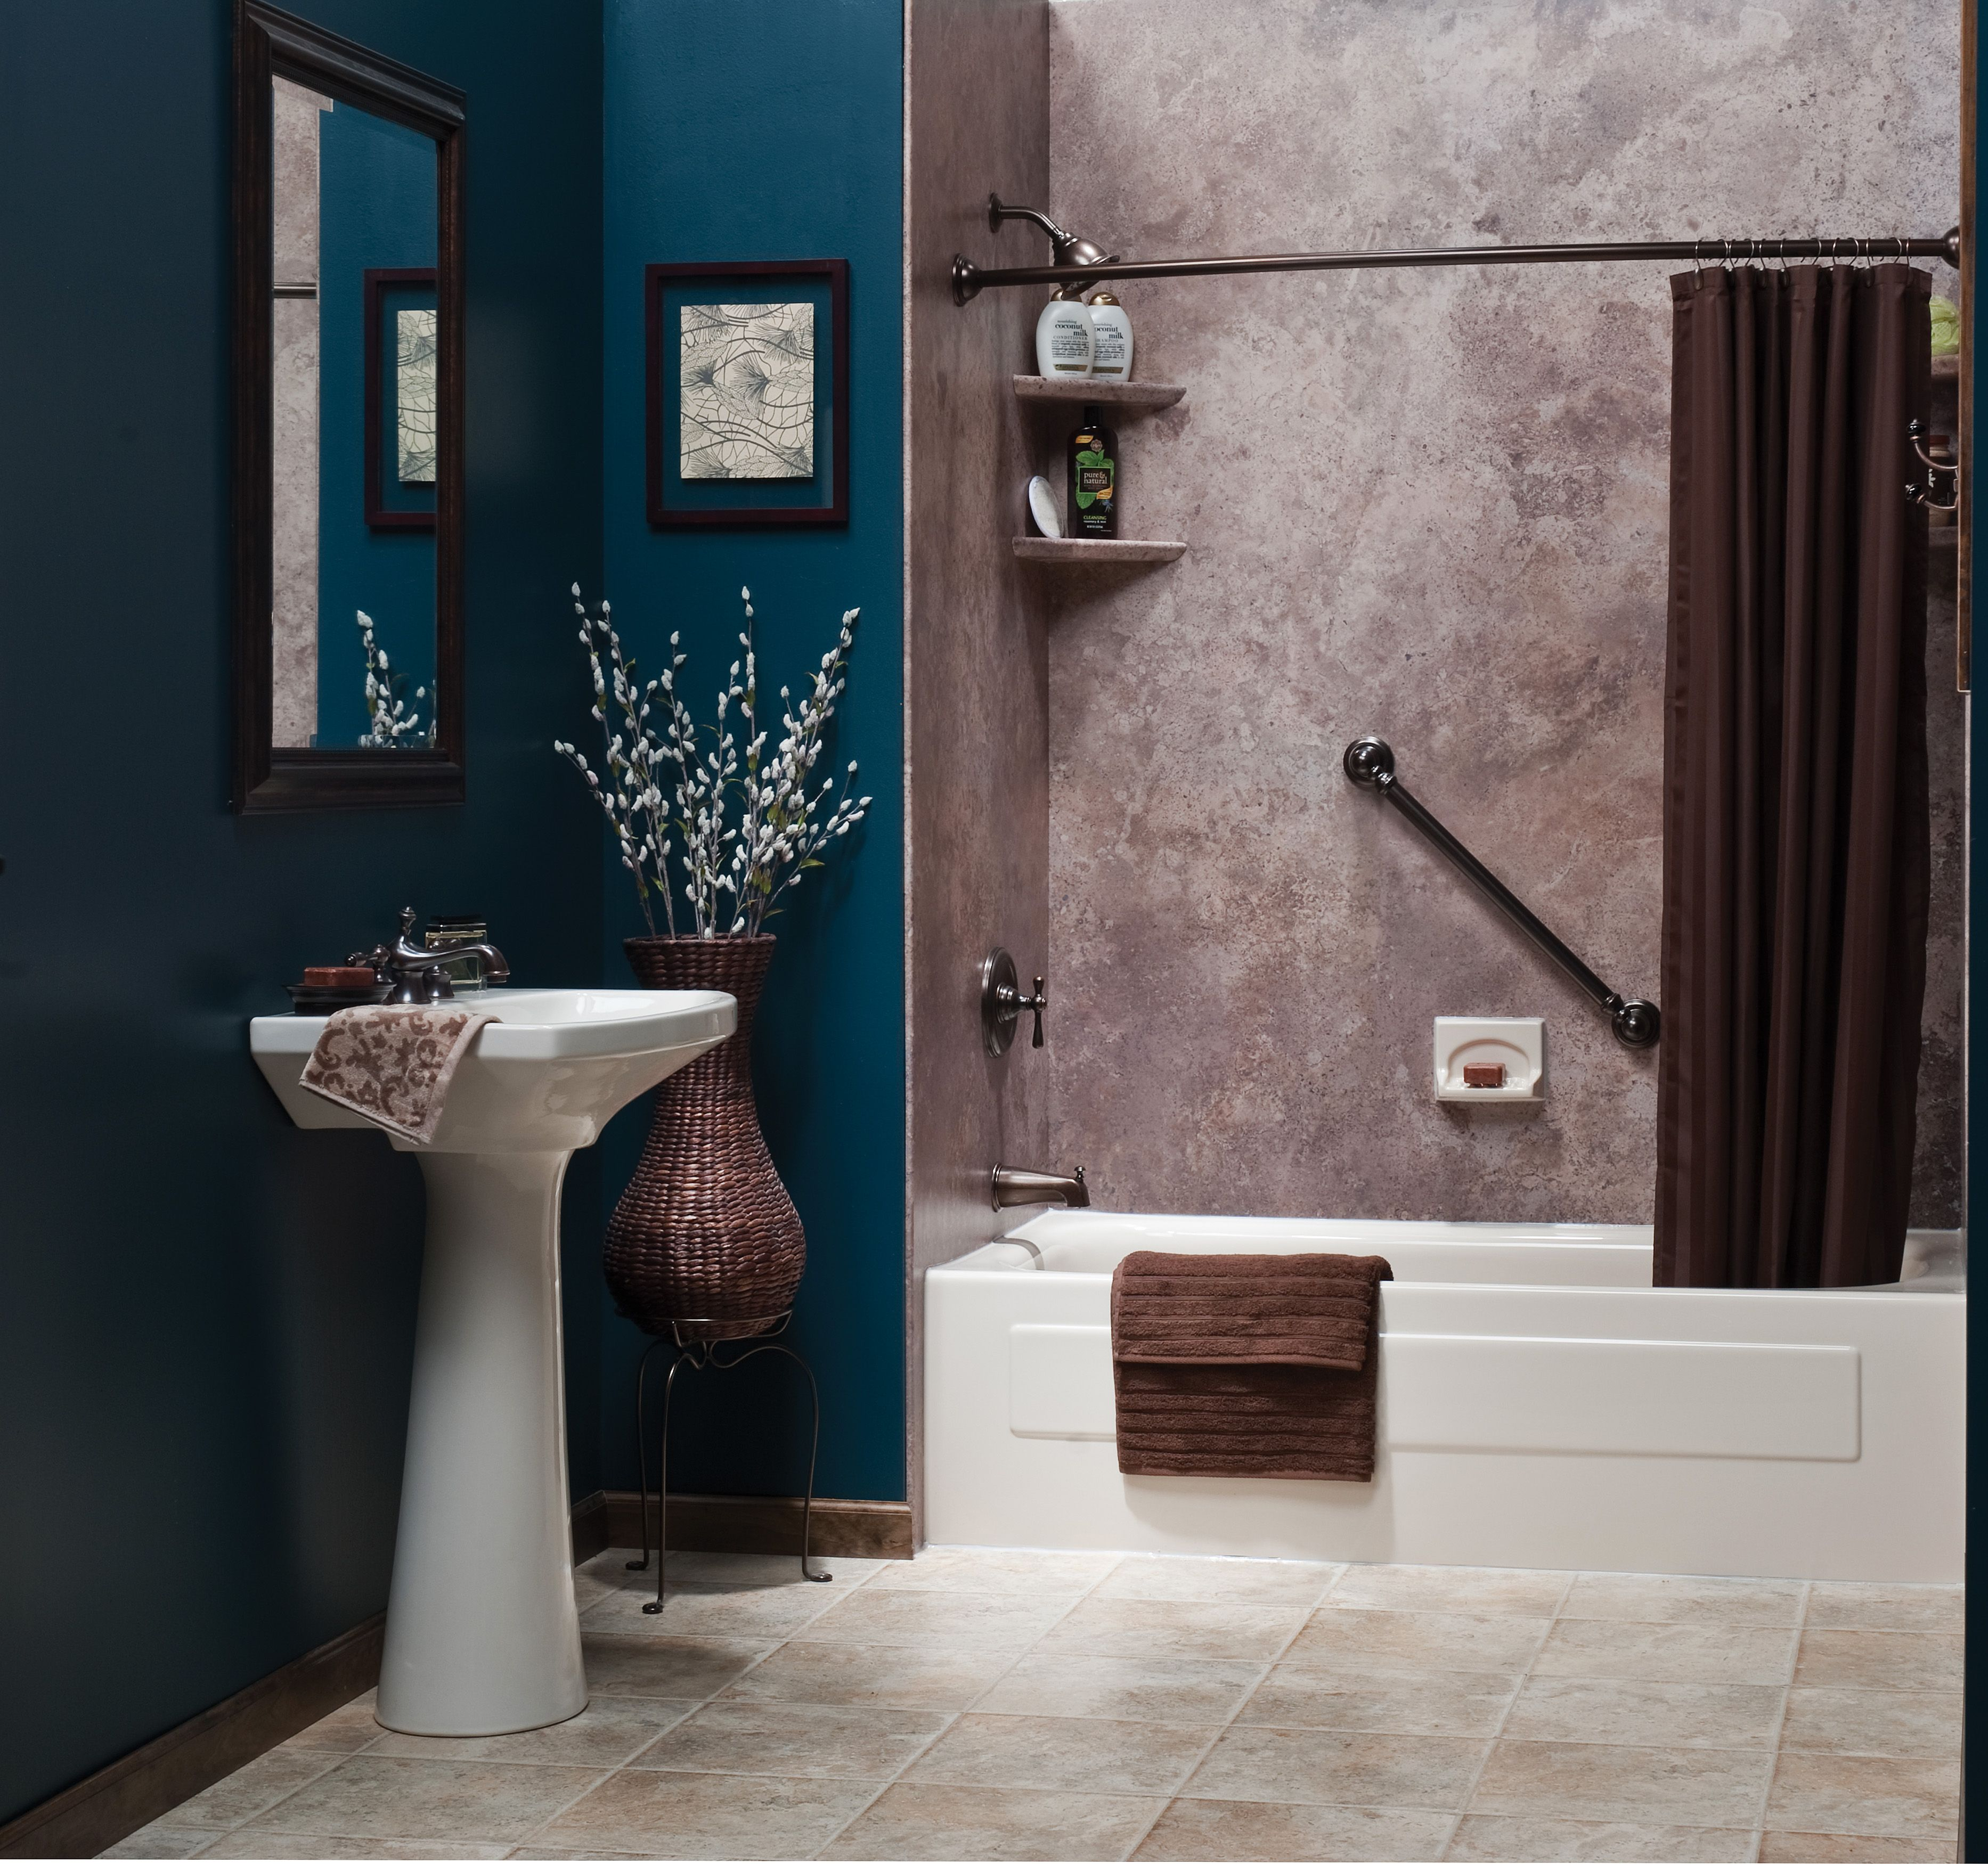 contractors and local trends danbury manhattan kitchen image xfile contractor al shocking birmingham of inspiration vanguard appealing ct ks u remodeling bathroom